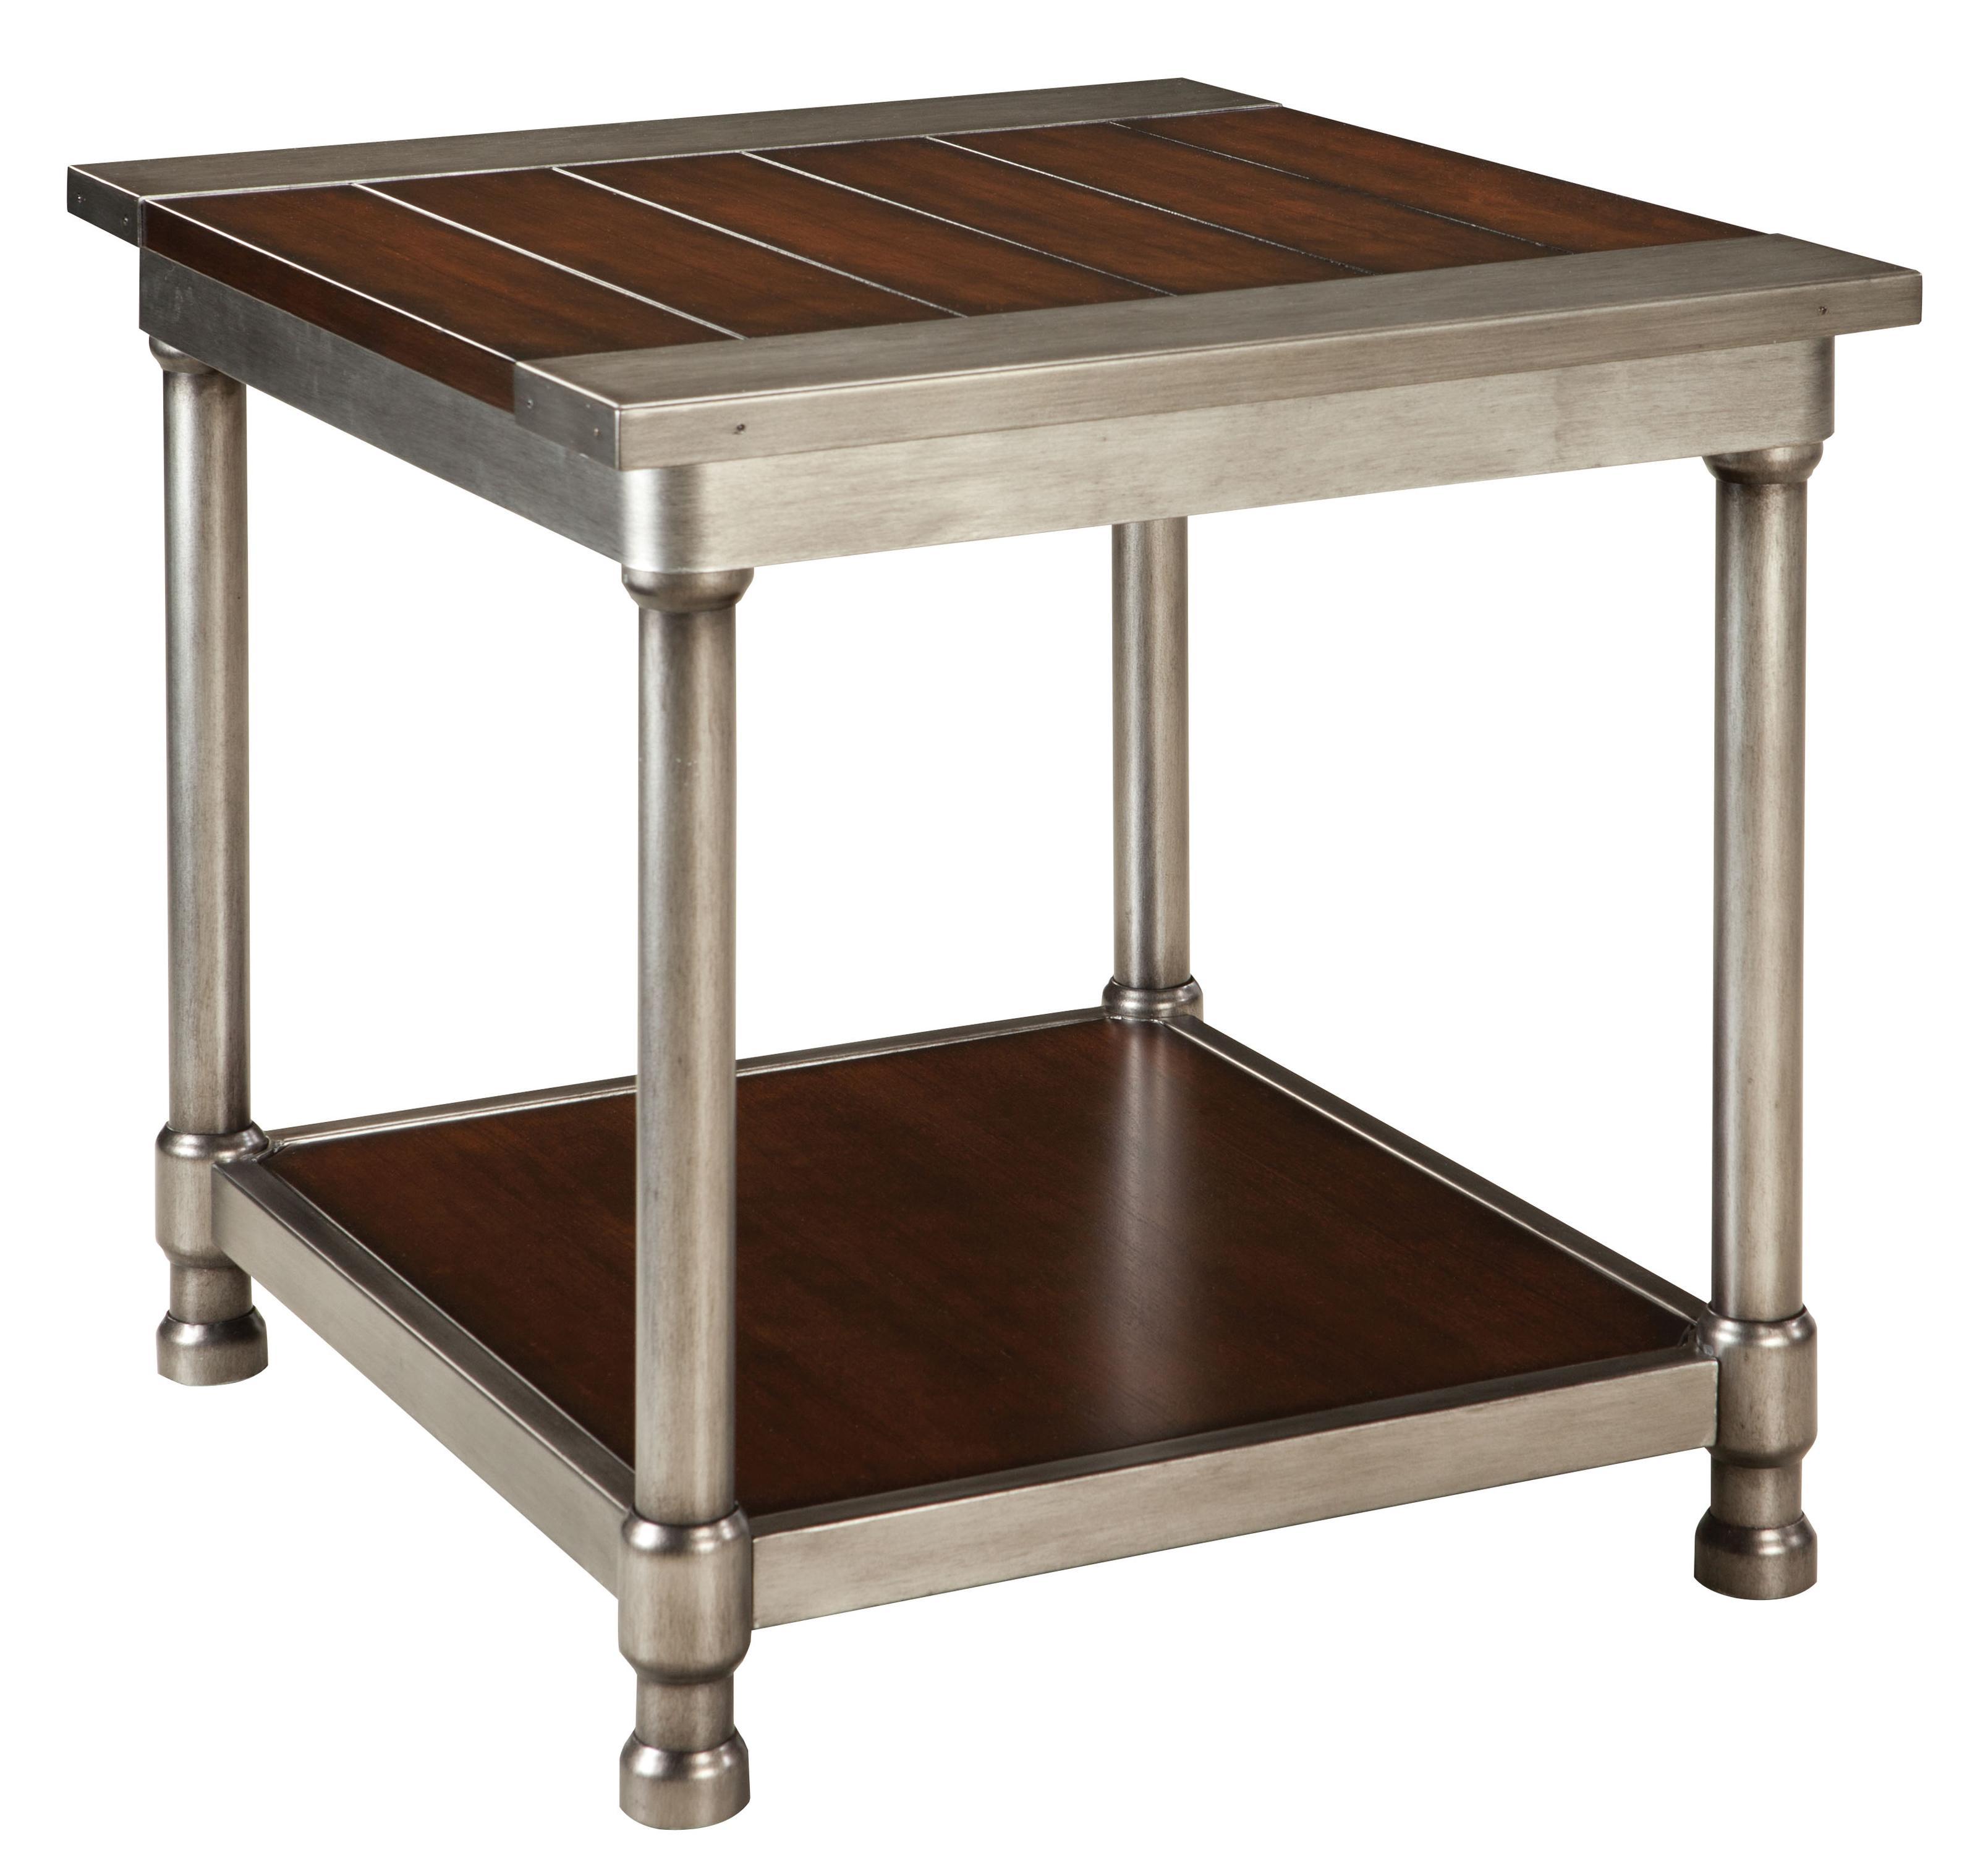 Standard Furniture Hudson Contemporary Single Shelf End